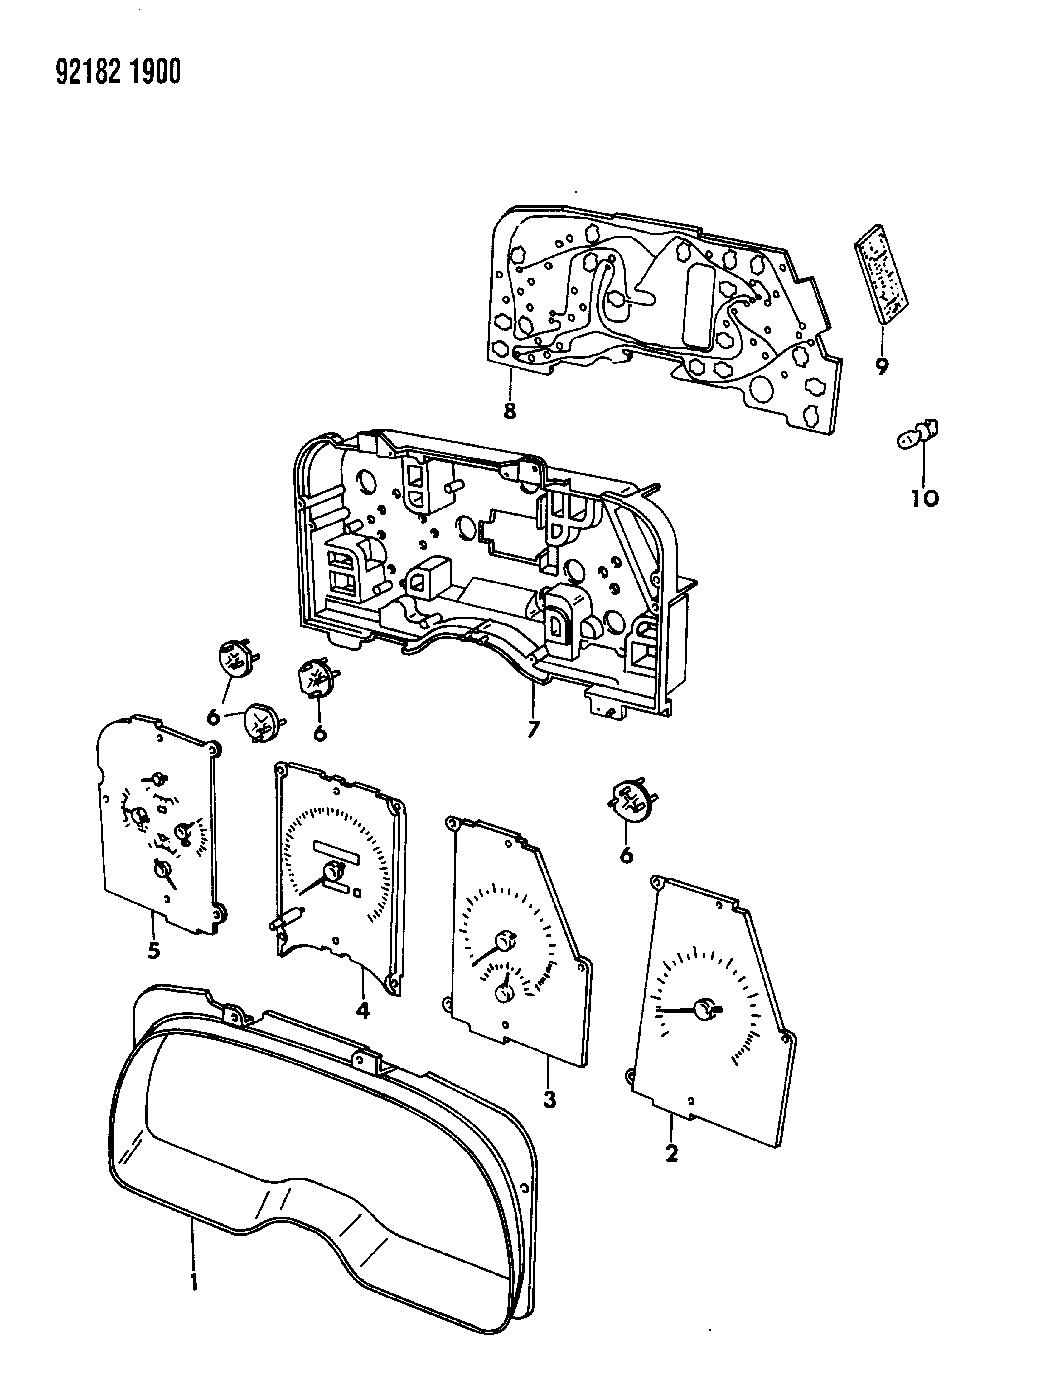 1992 Dodge Daytona Instrument Panel Cluster